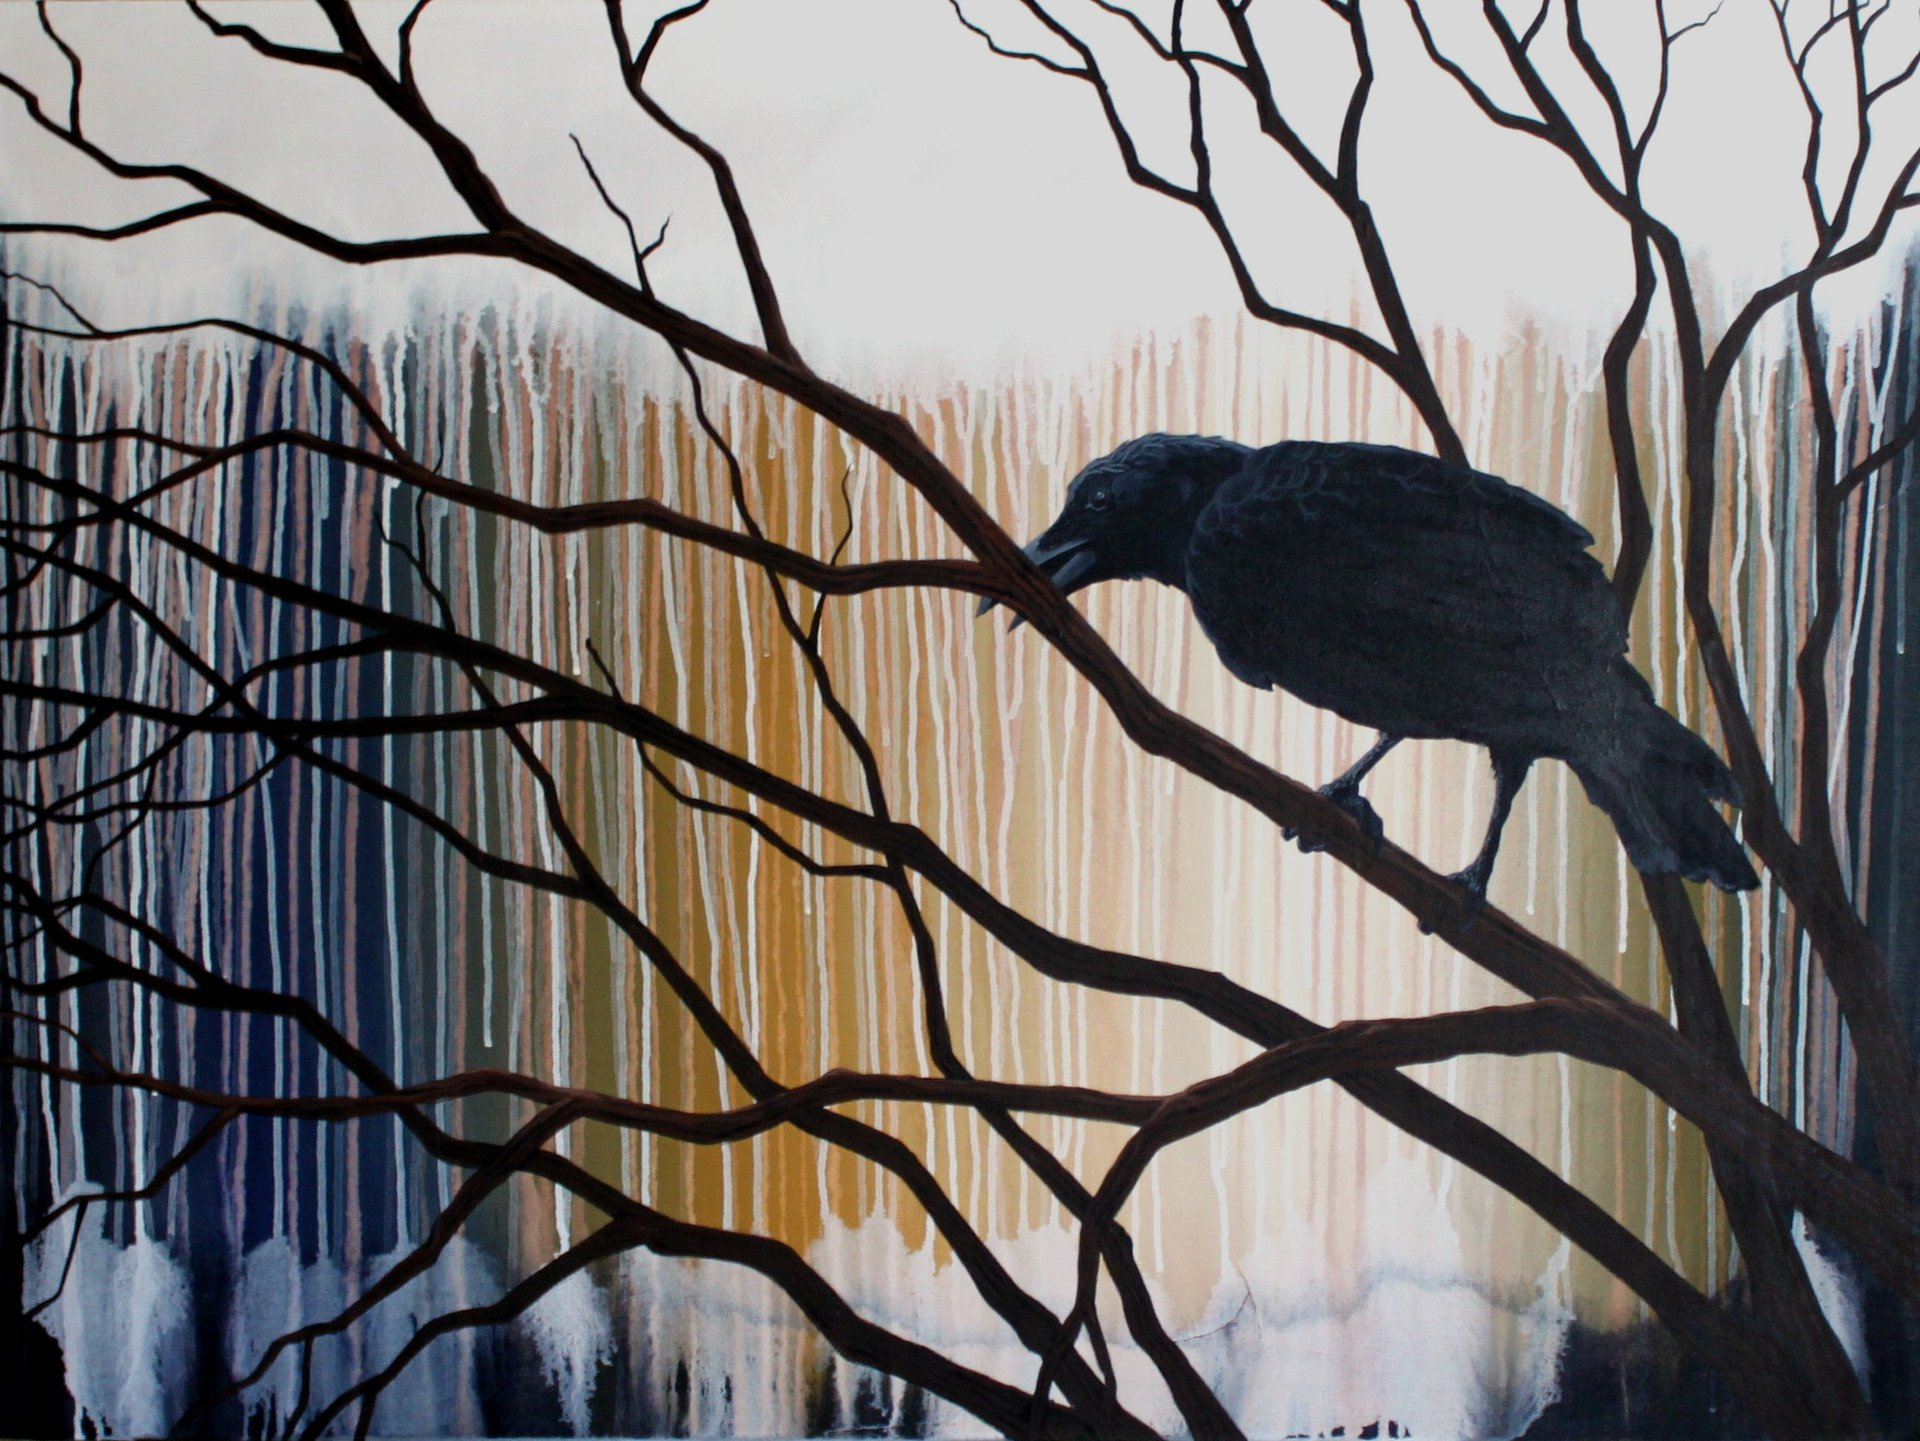 Crow+7+too